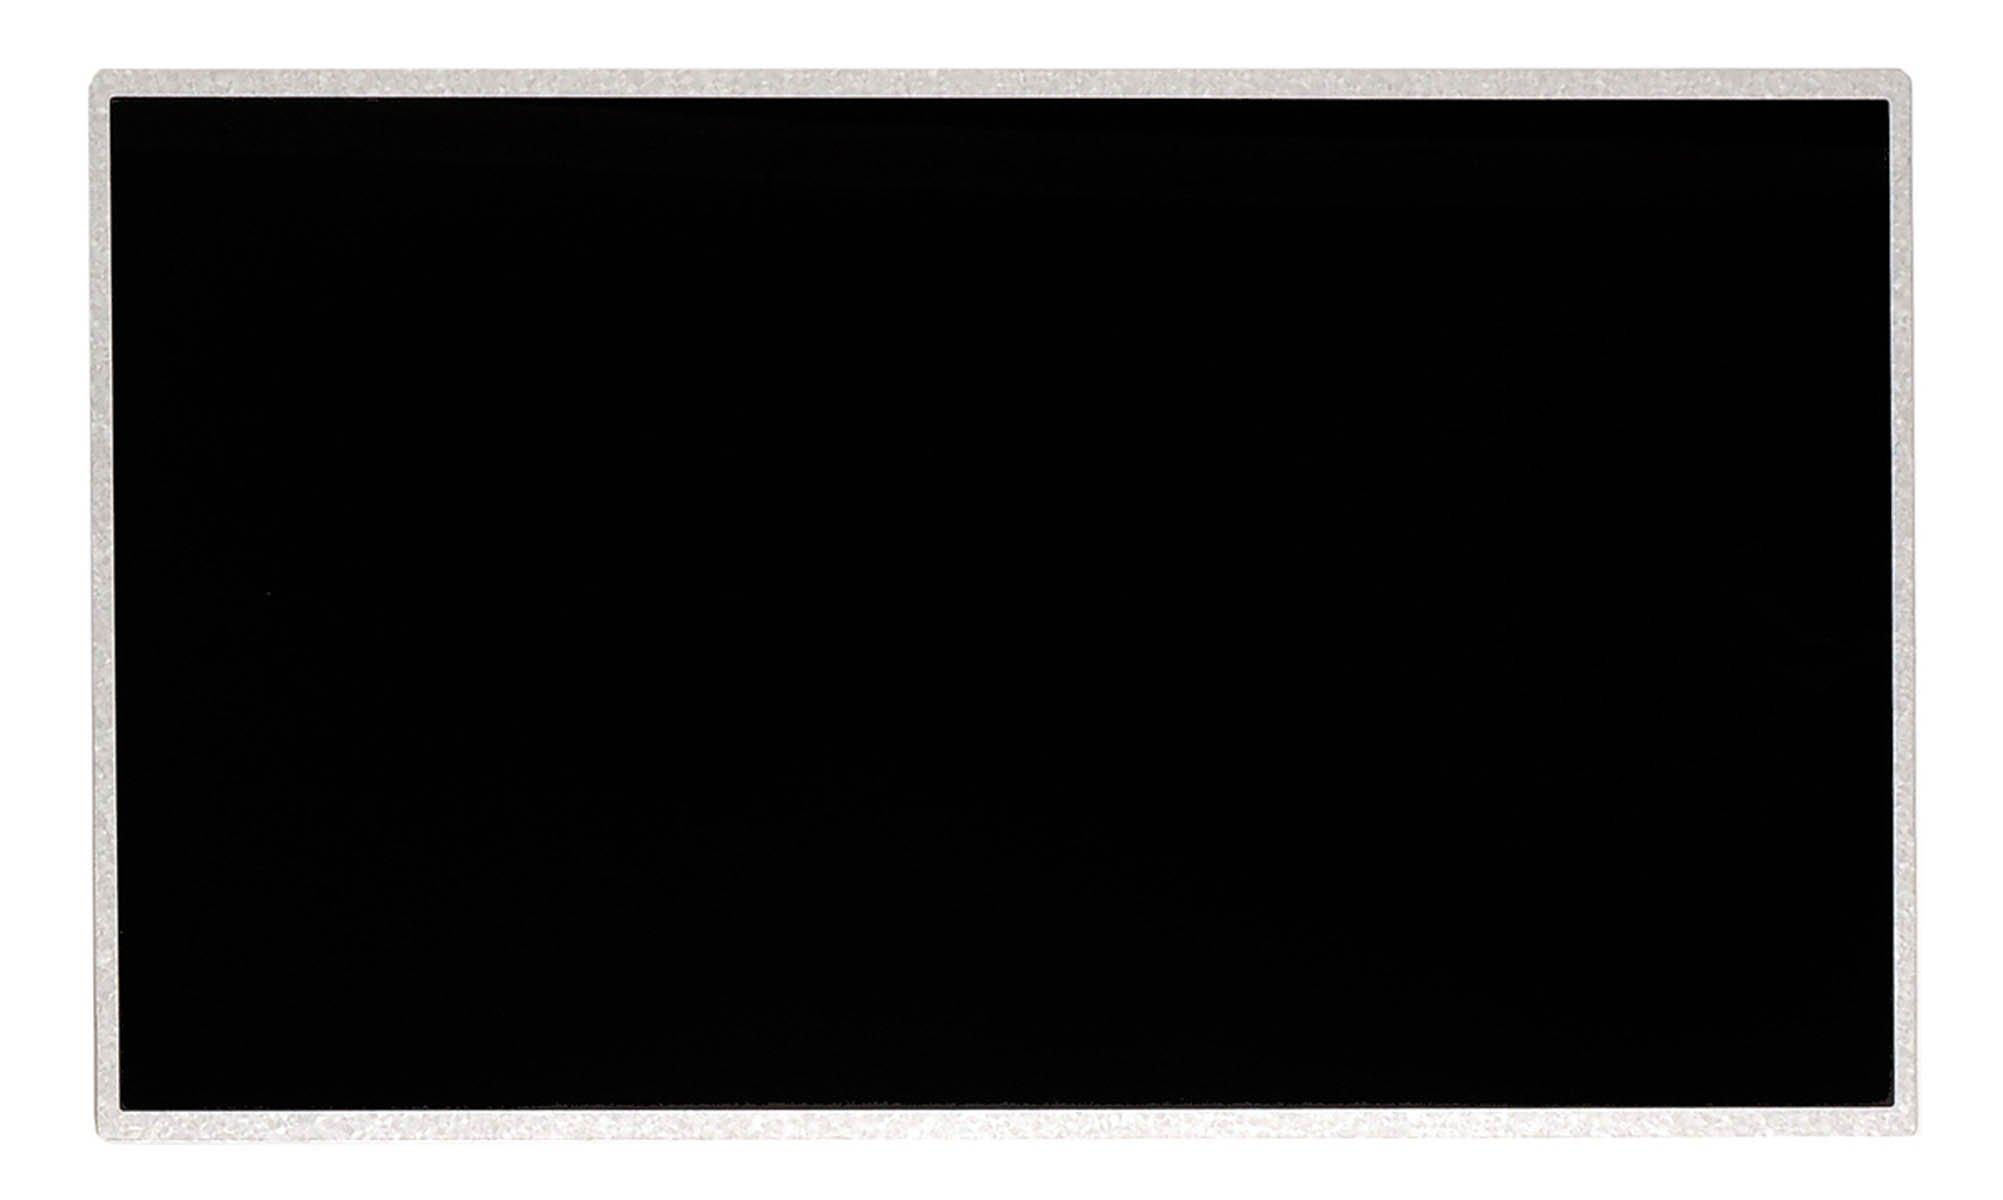 "Toshiba Satellite C655-S5305 Laptop LCD Screen Replacement 15.6"" WXGA HD LED"